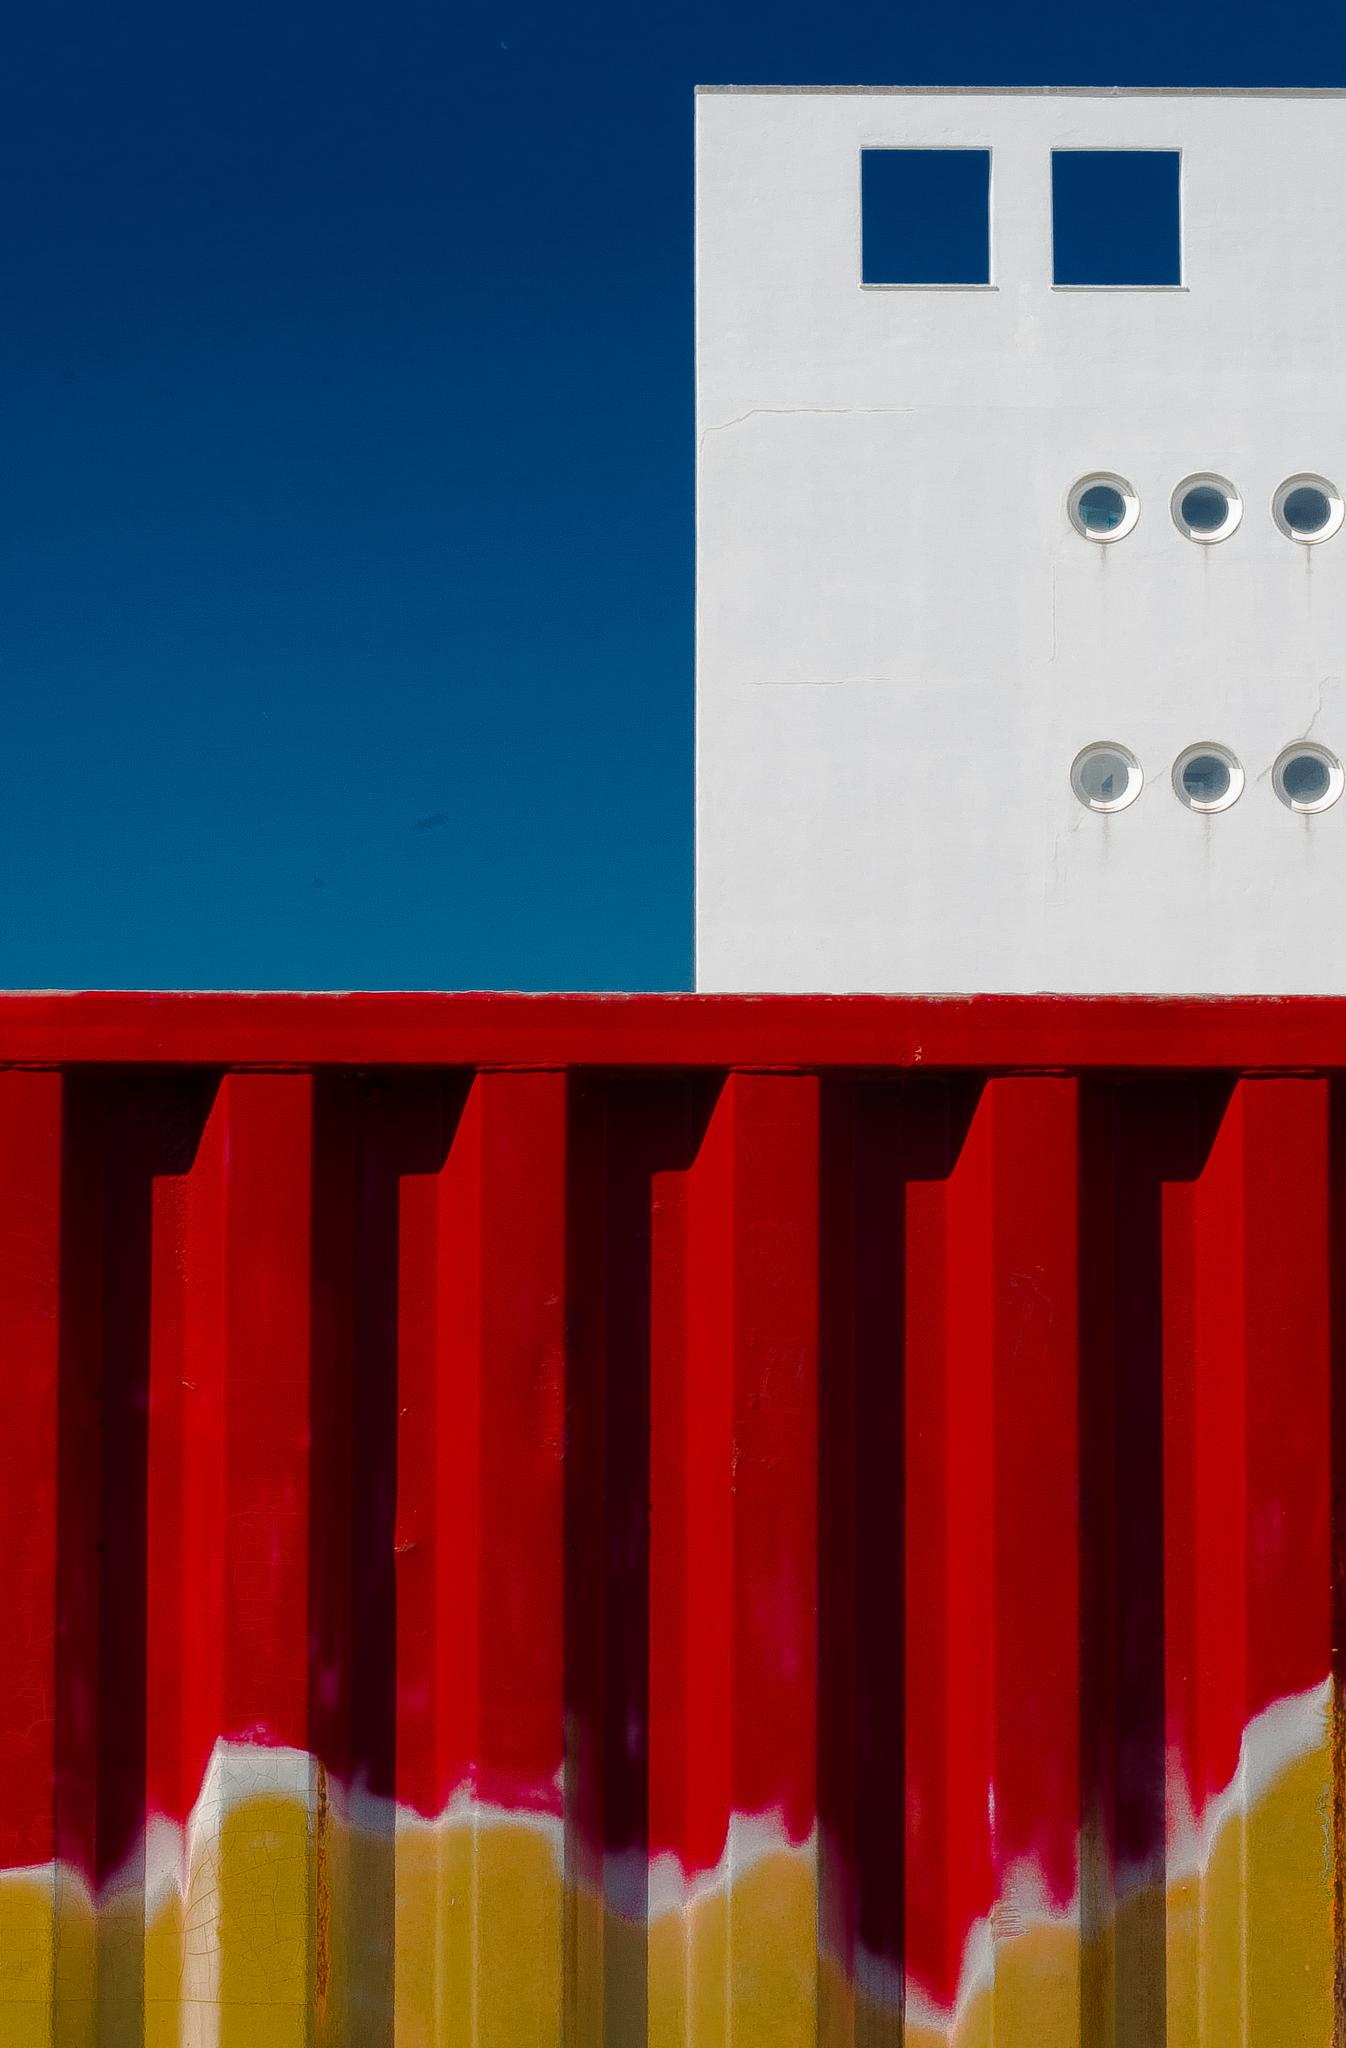 Urban colors by Stefano Regini